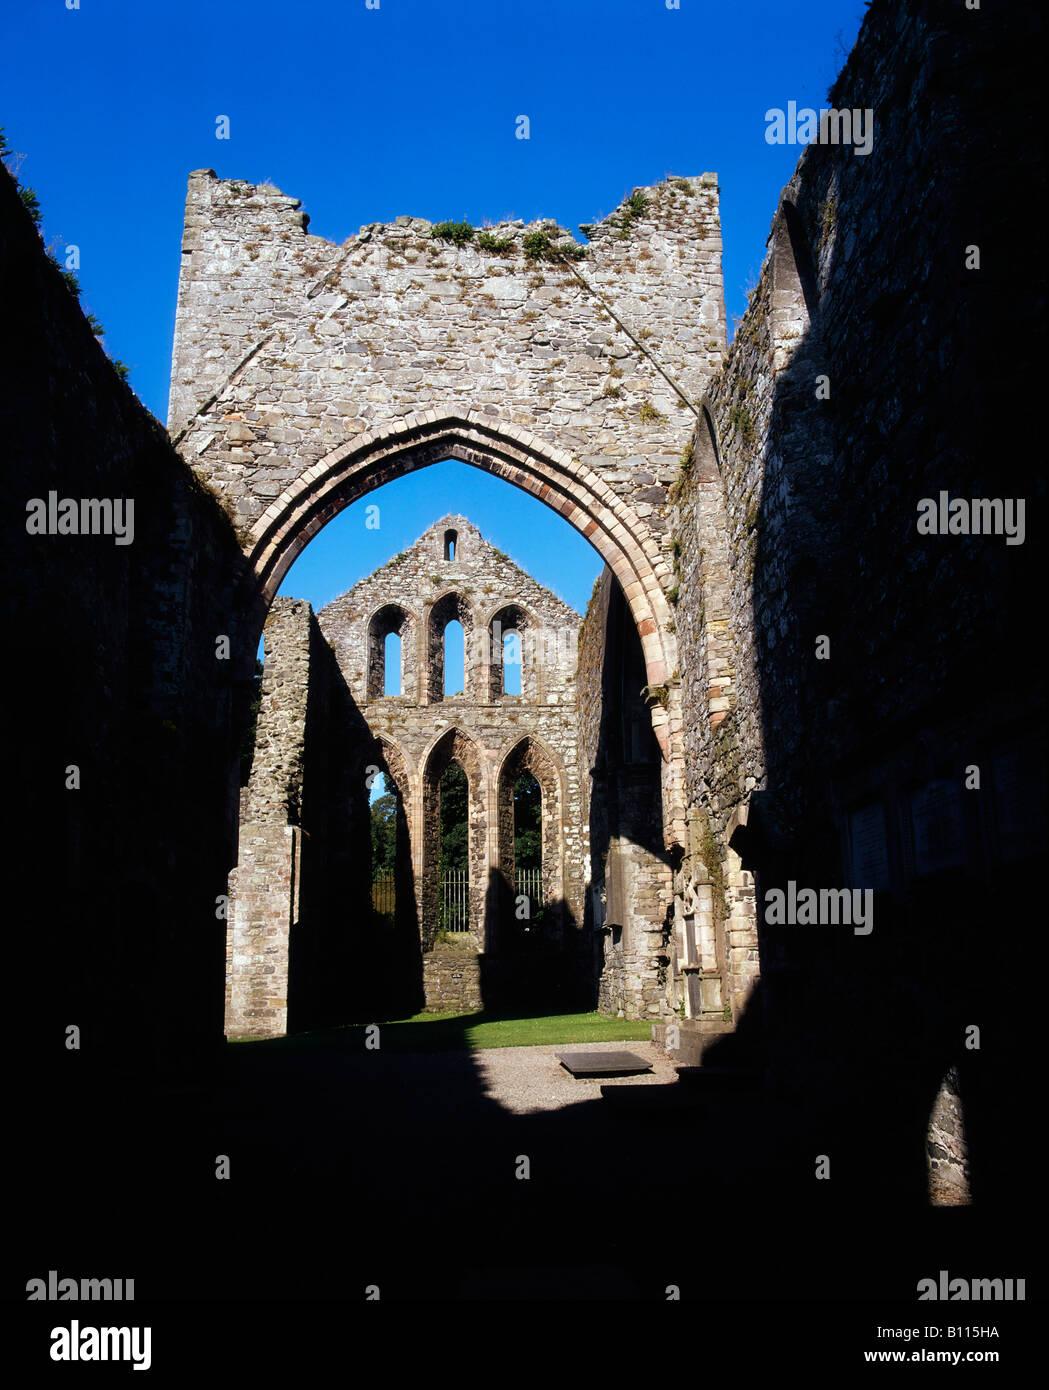 Co Down, Grey Abbey, estab. 1193, on Strangford Lough, Ireland - Stock Image